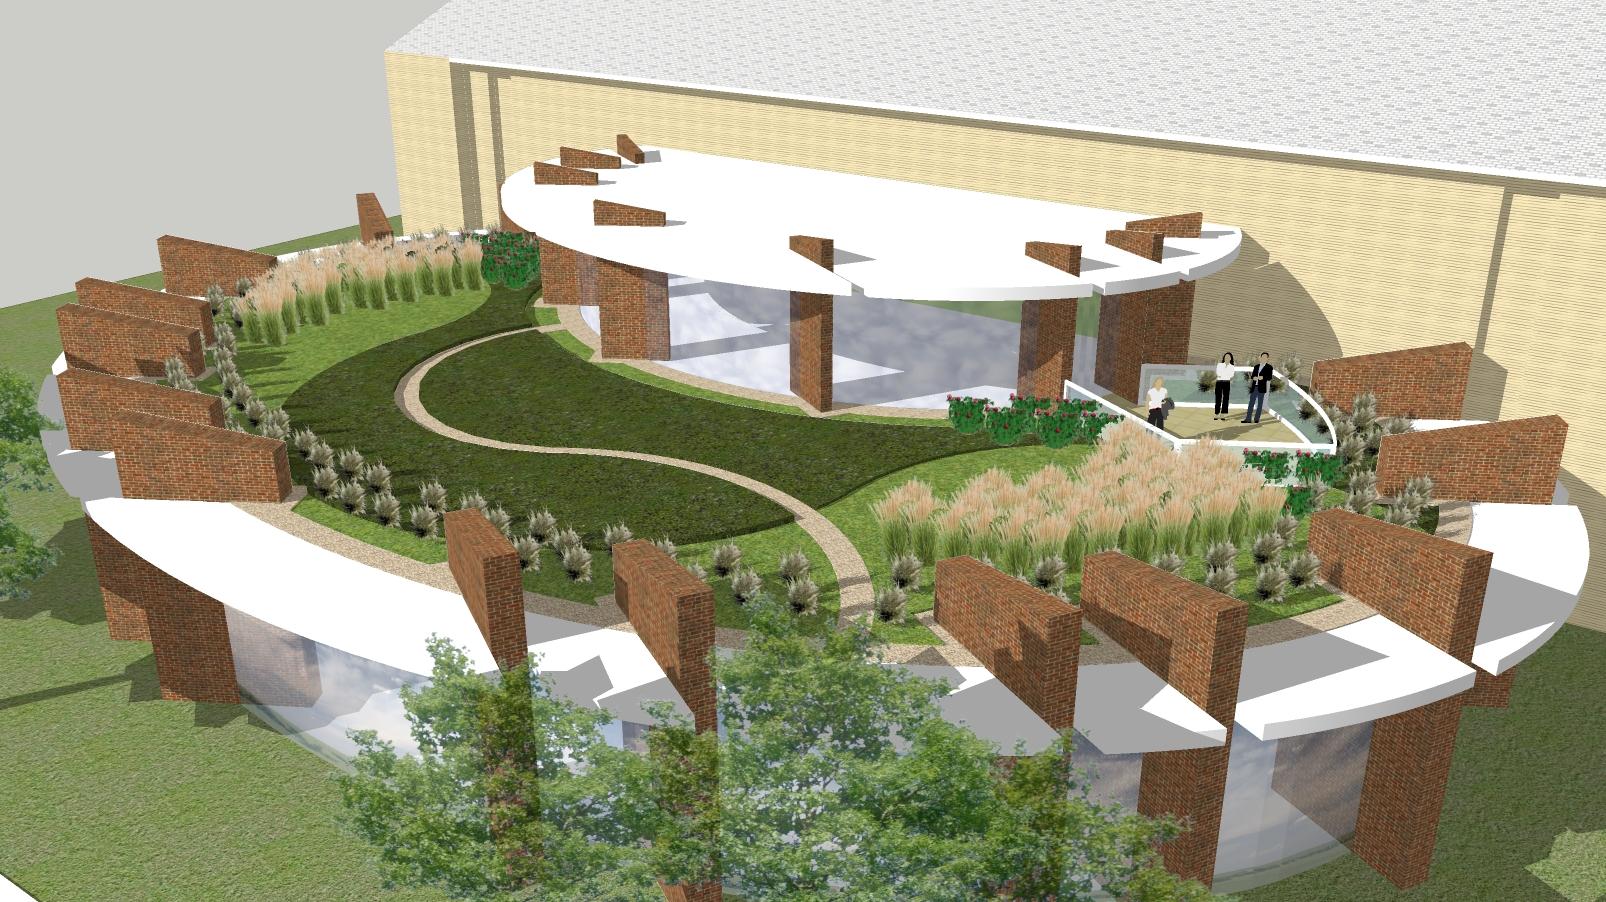 Charming roof garden plan gallery best idea home design - Enchanting rooftop garden ideas ...